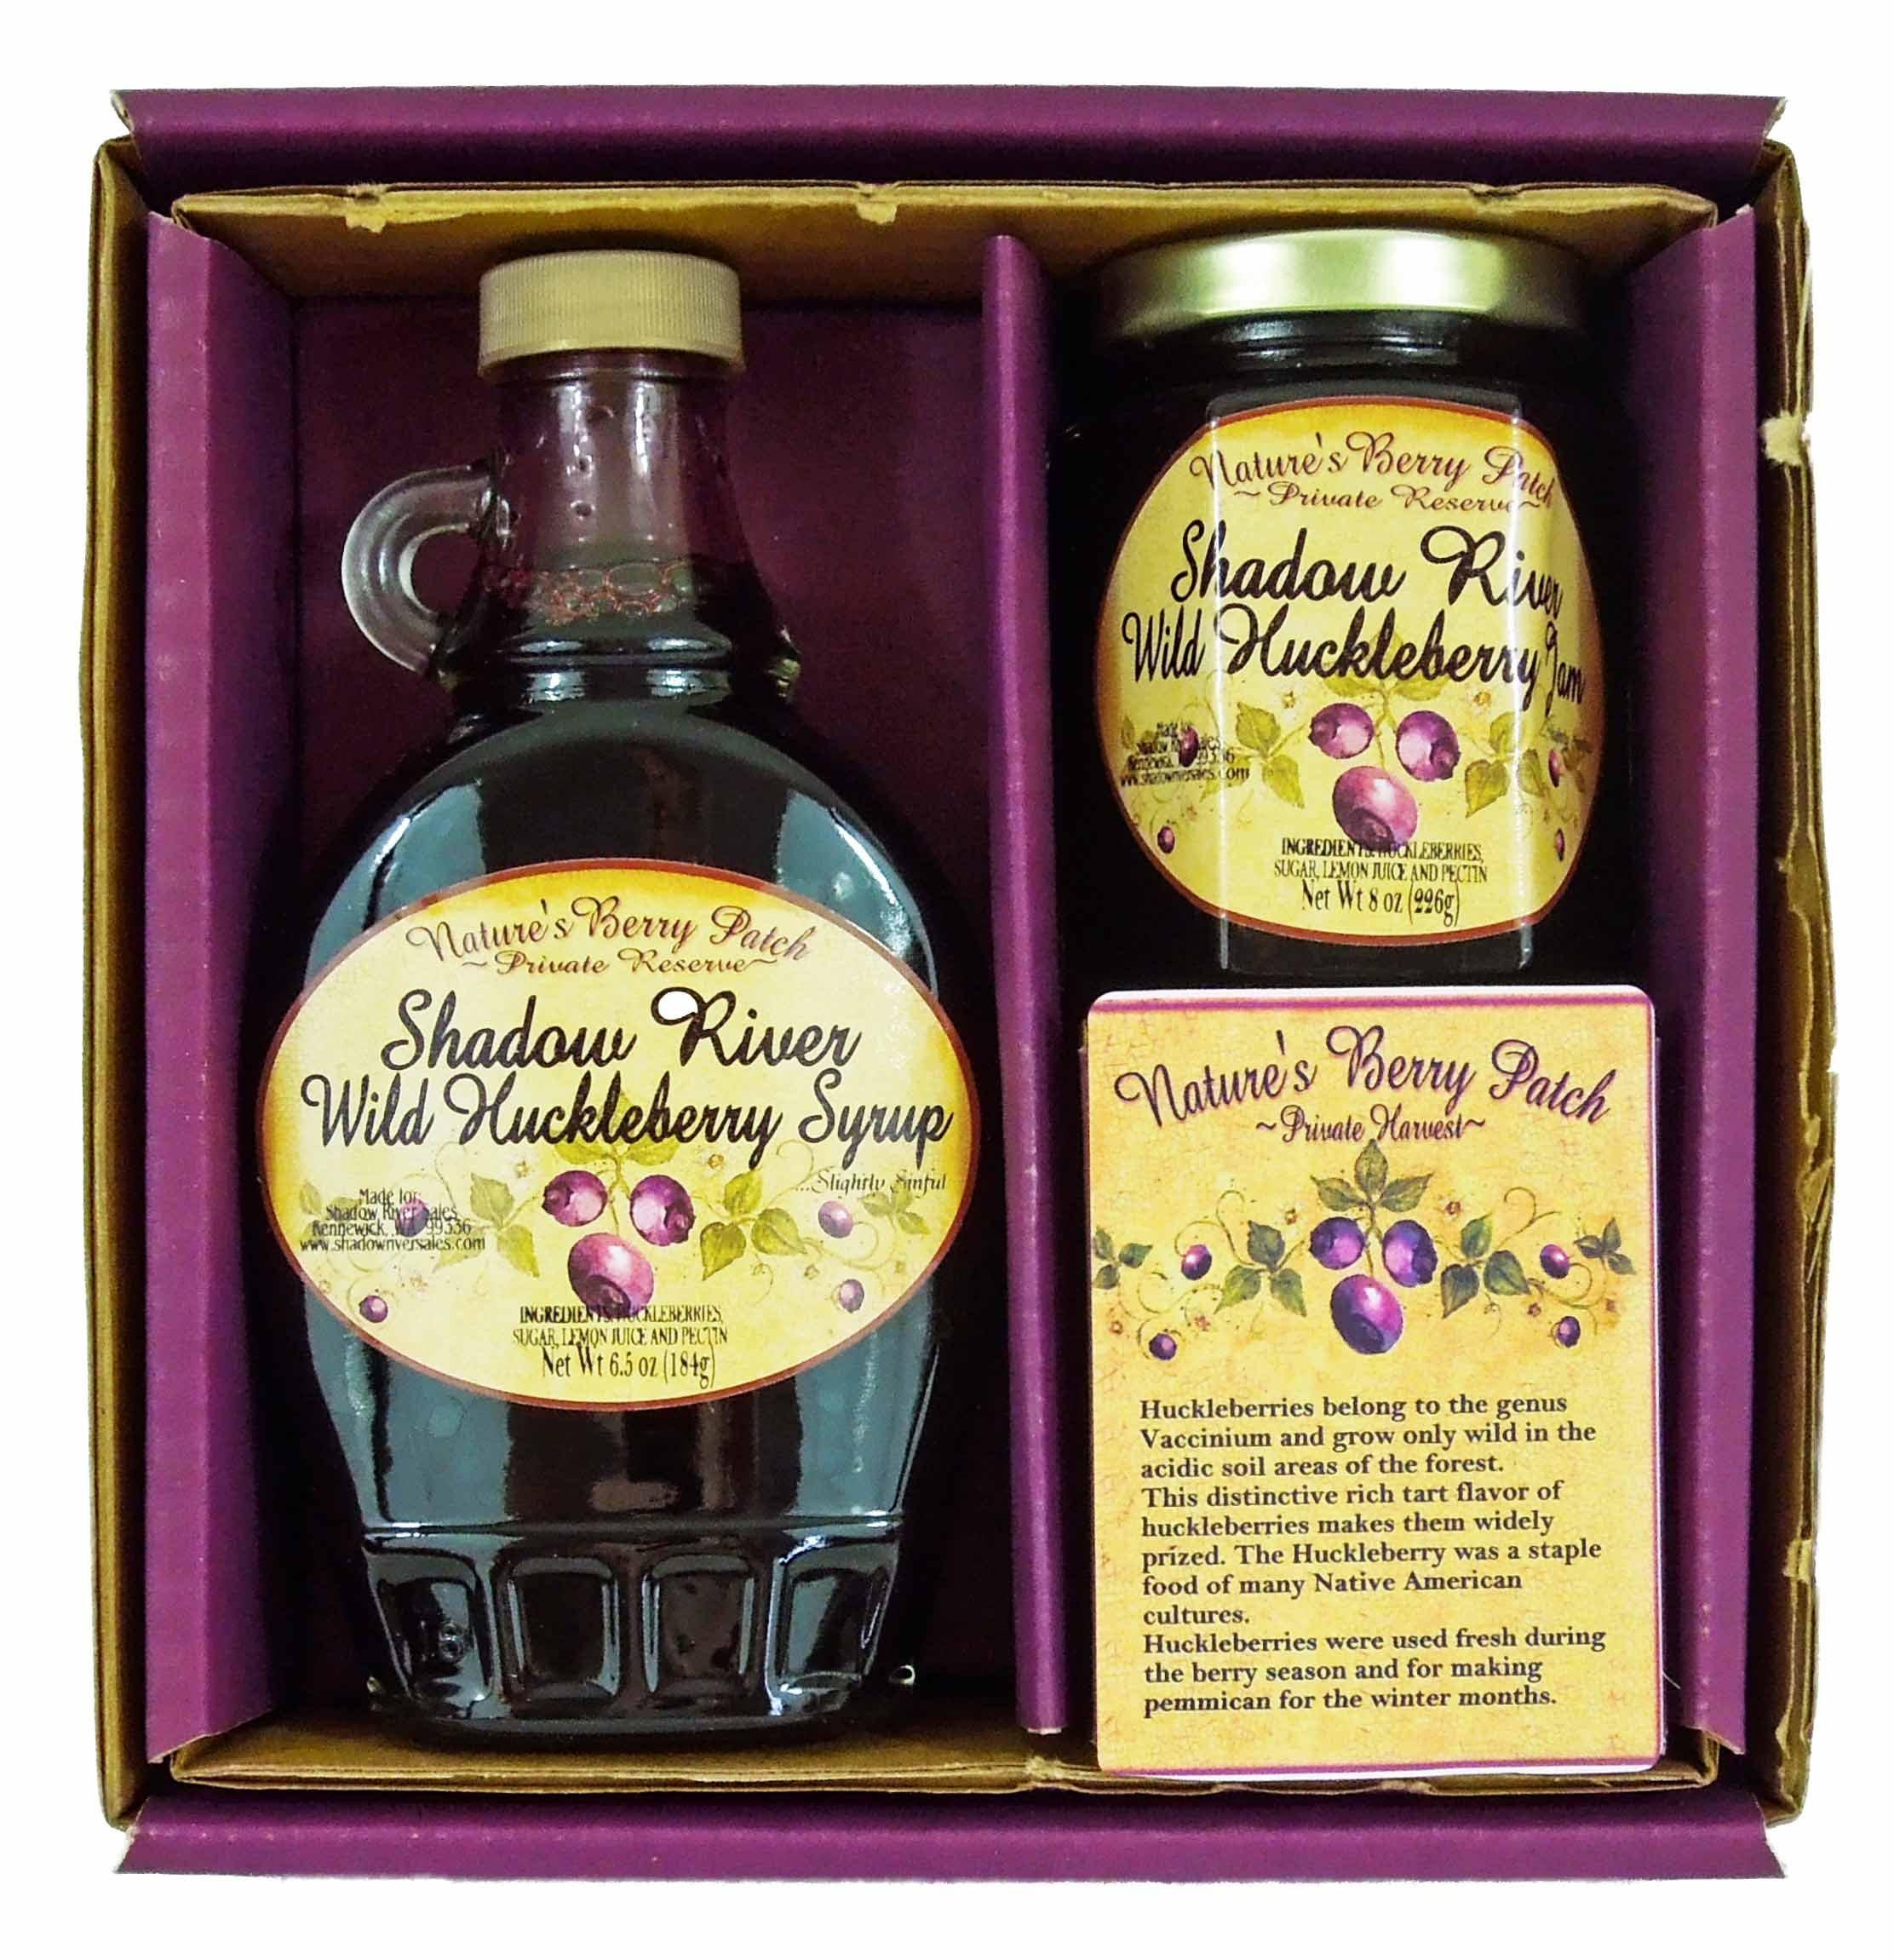 Shadow River Wild Huckleberry Gourmet Boxed Set 8 oz Jam & 10 oz Syrup